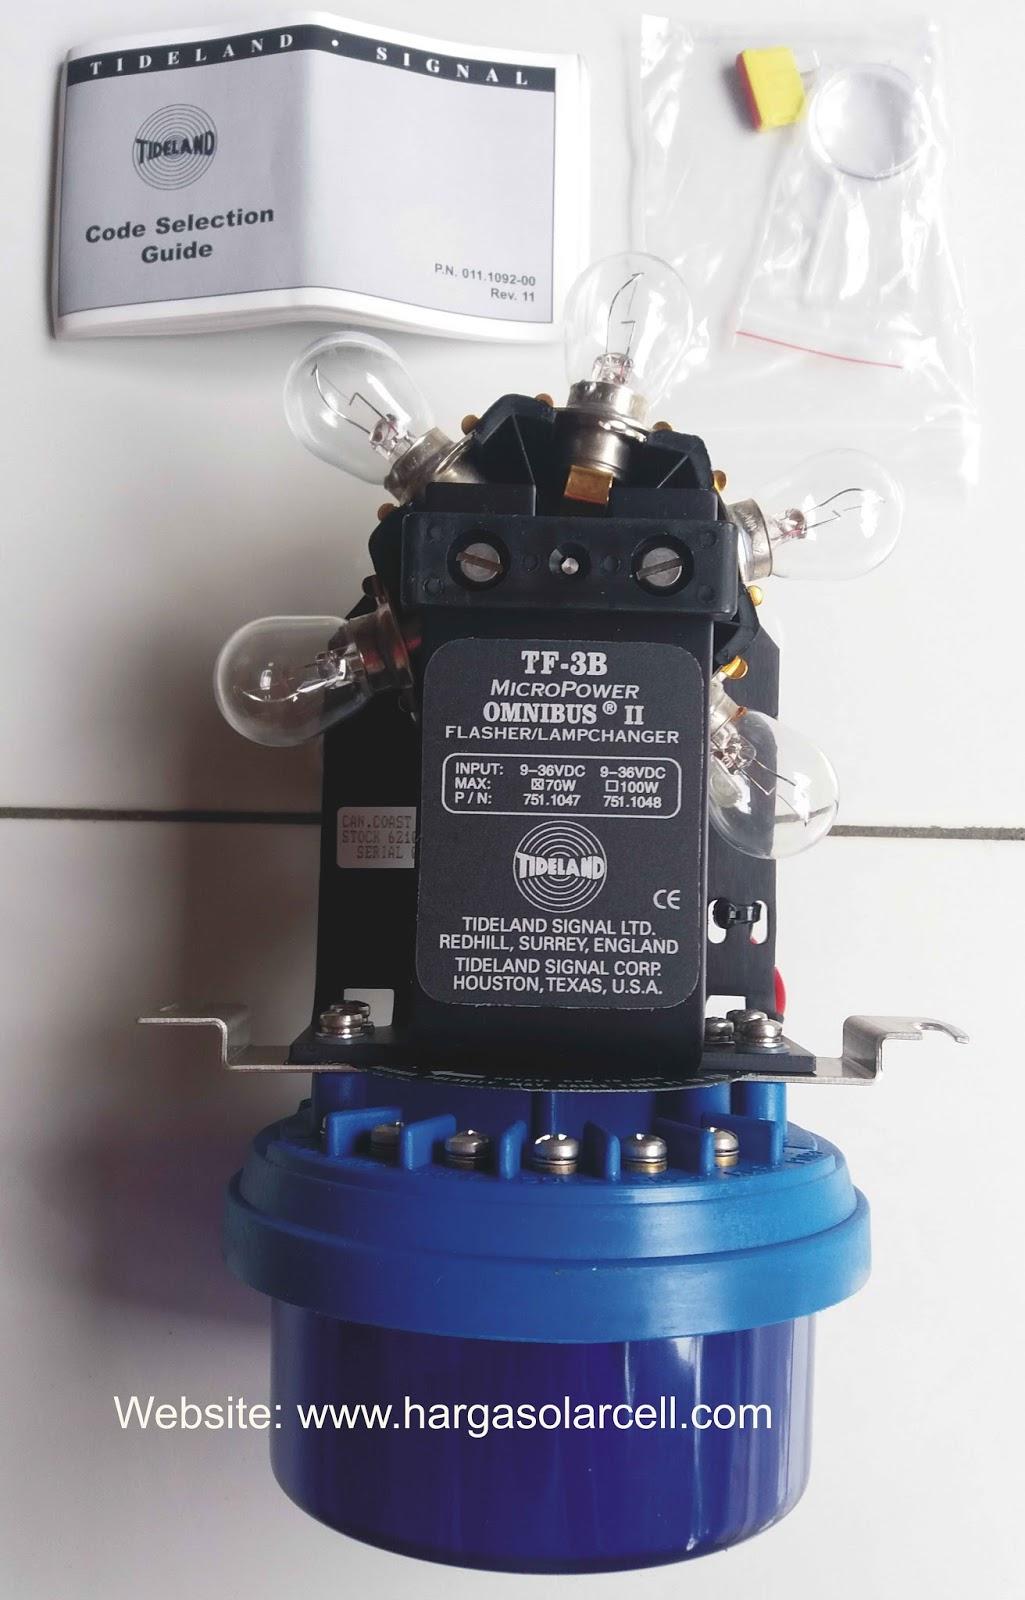 Sunergy Indonesia Harga Solar Cell Controller Mppt